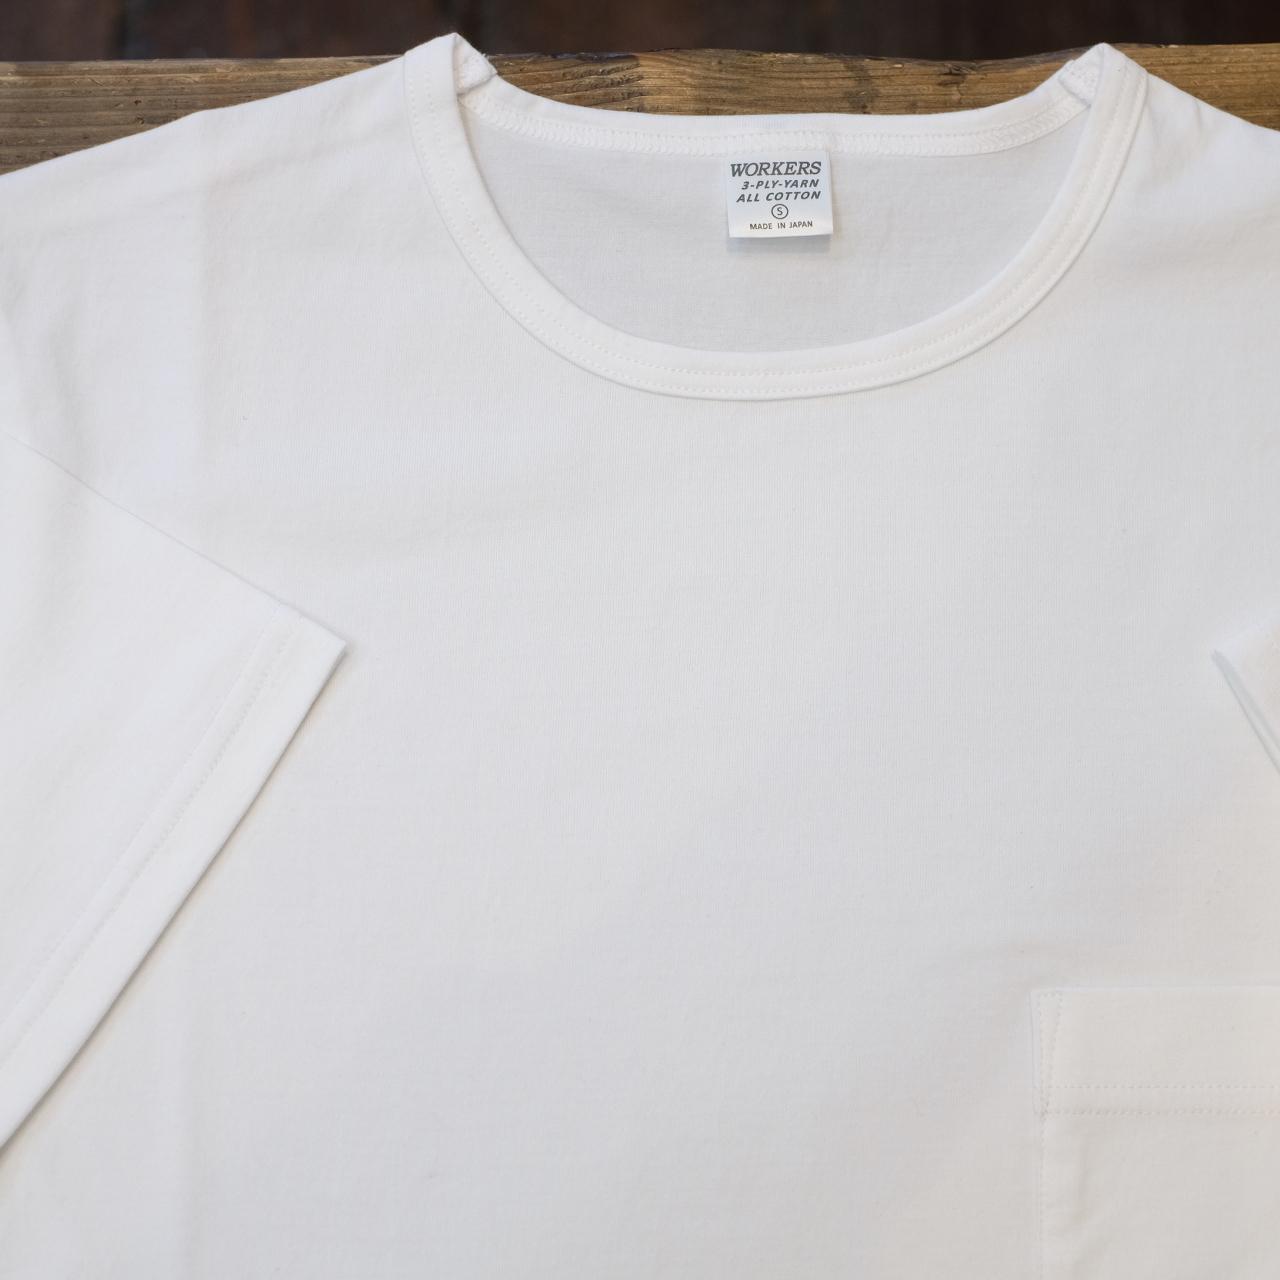 Workers(ワーカーズ) 別注 3PLYスリム ポケットTシャツ ホワイト